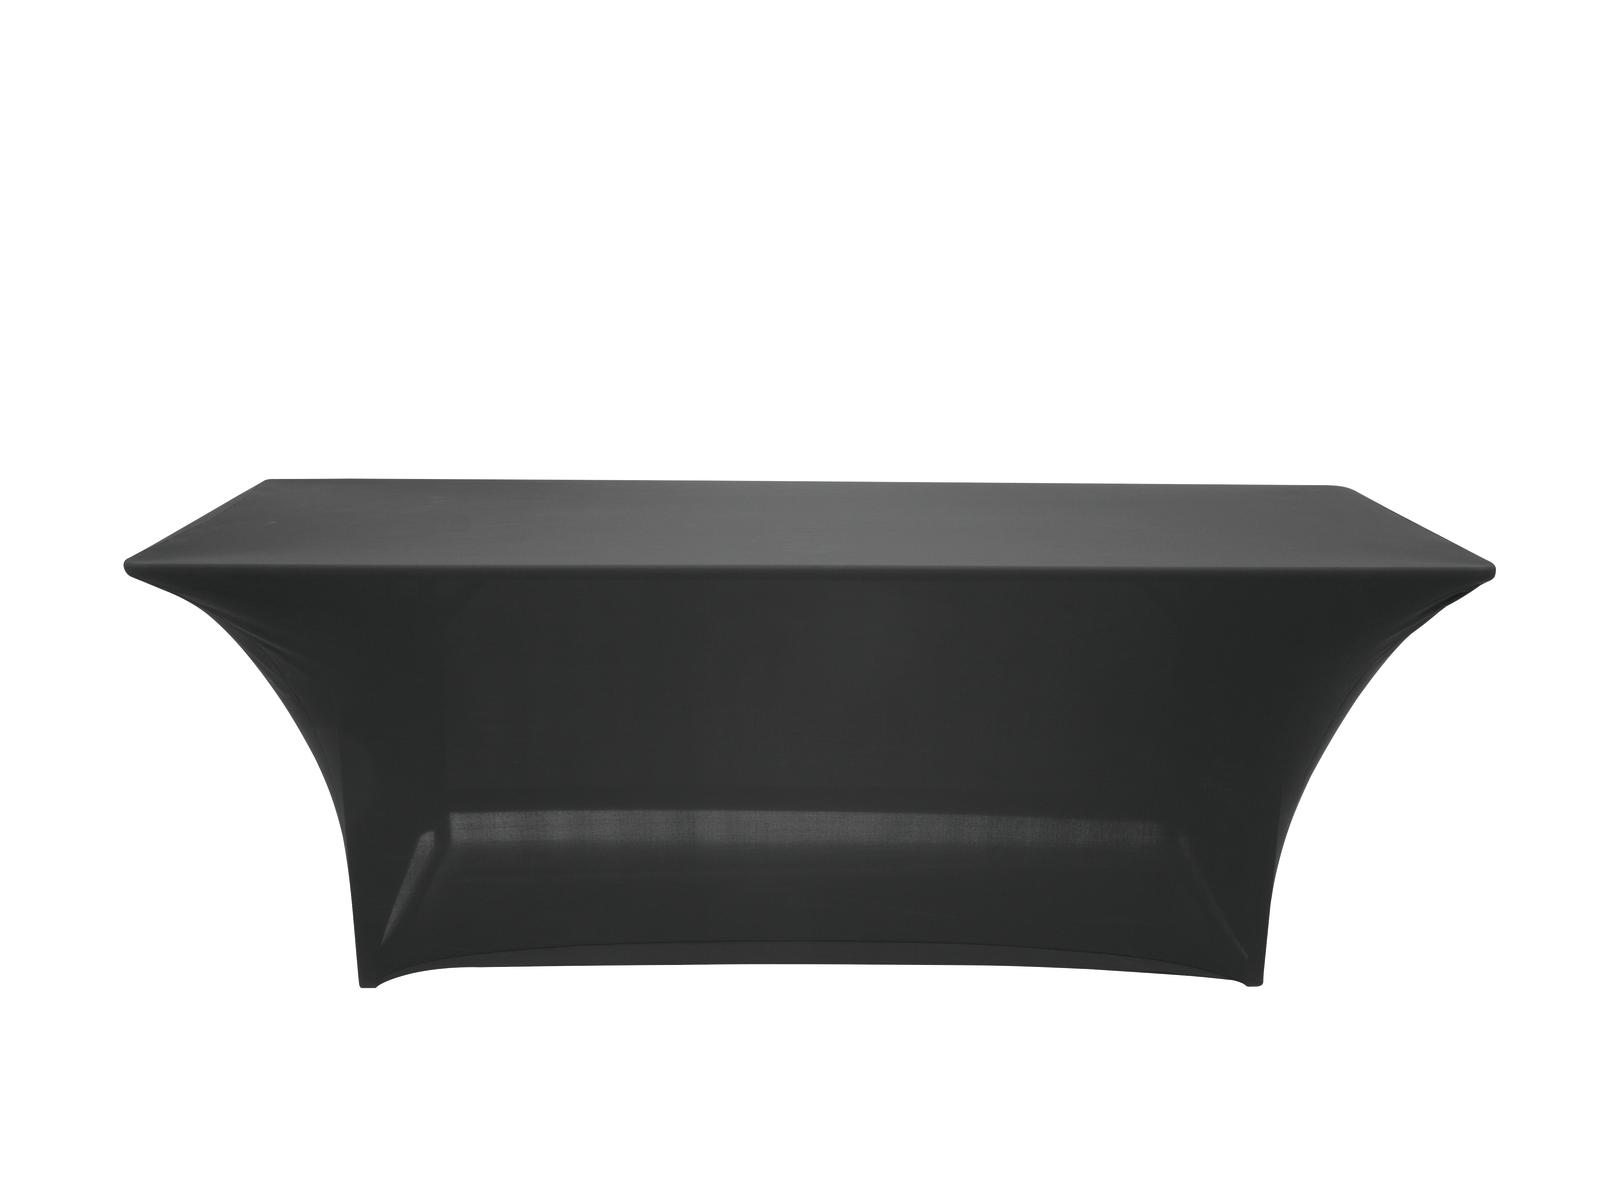 ESPANDERE XPTG Deskcover chiusa nero